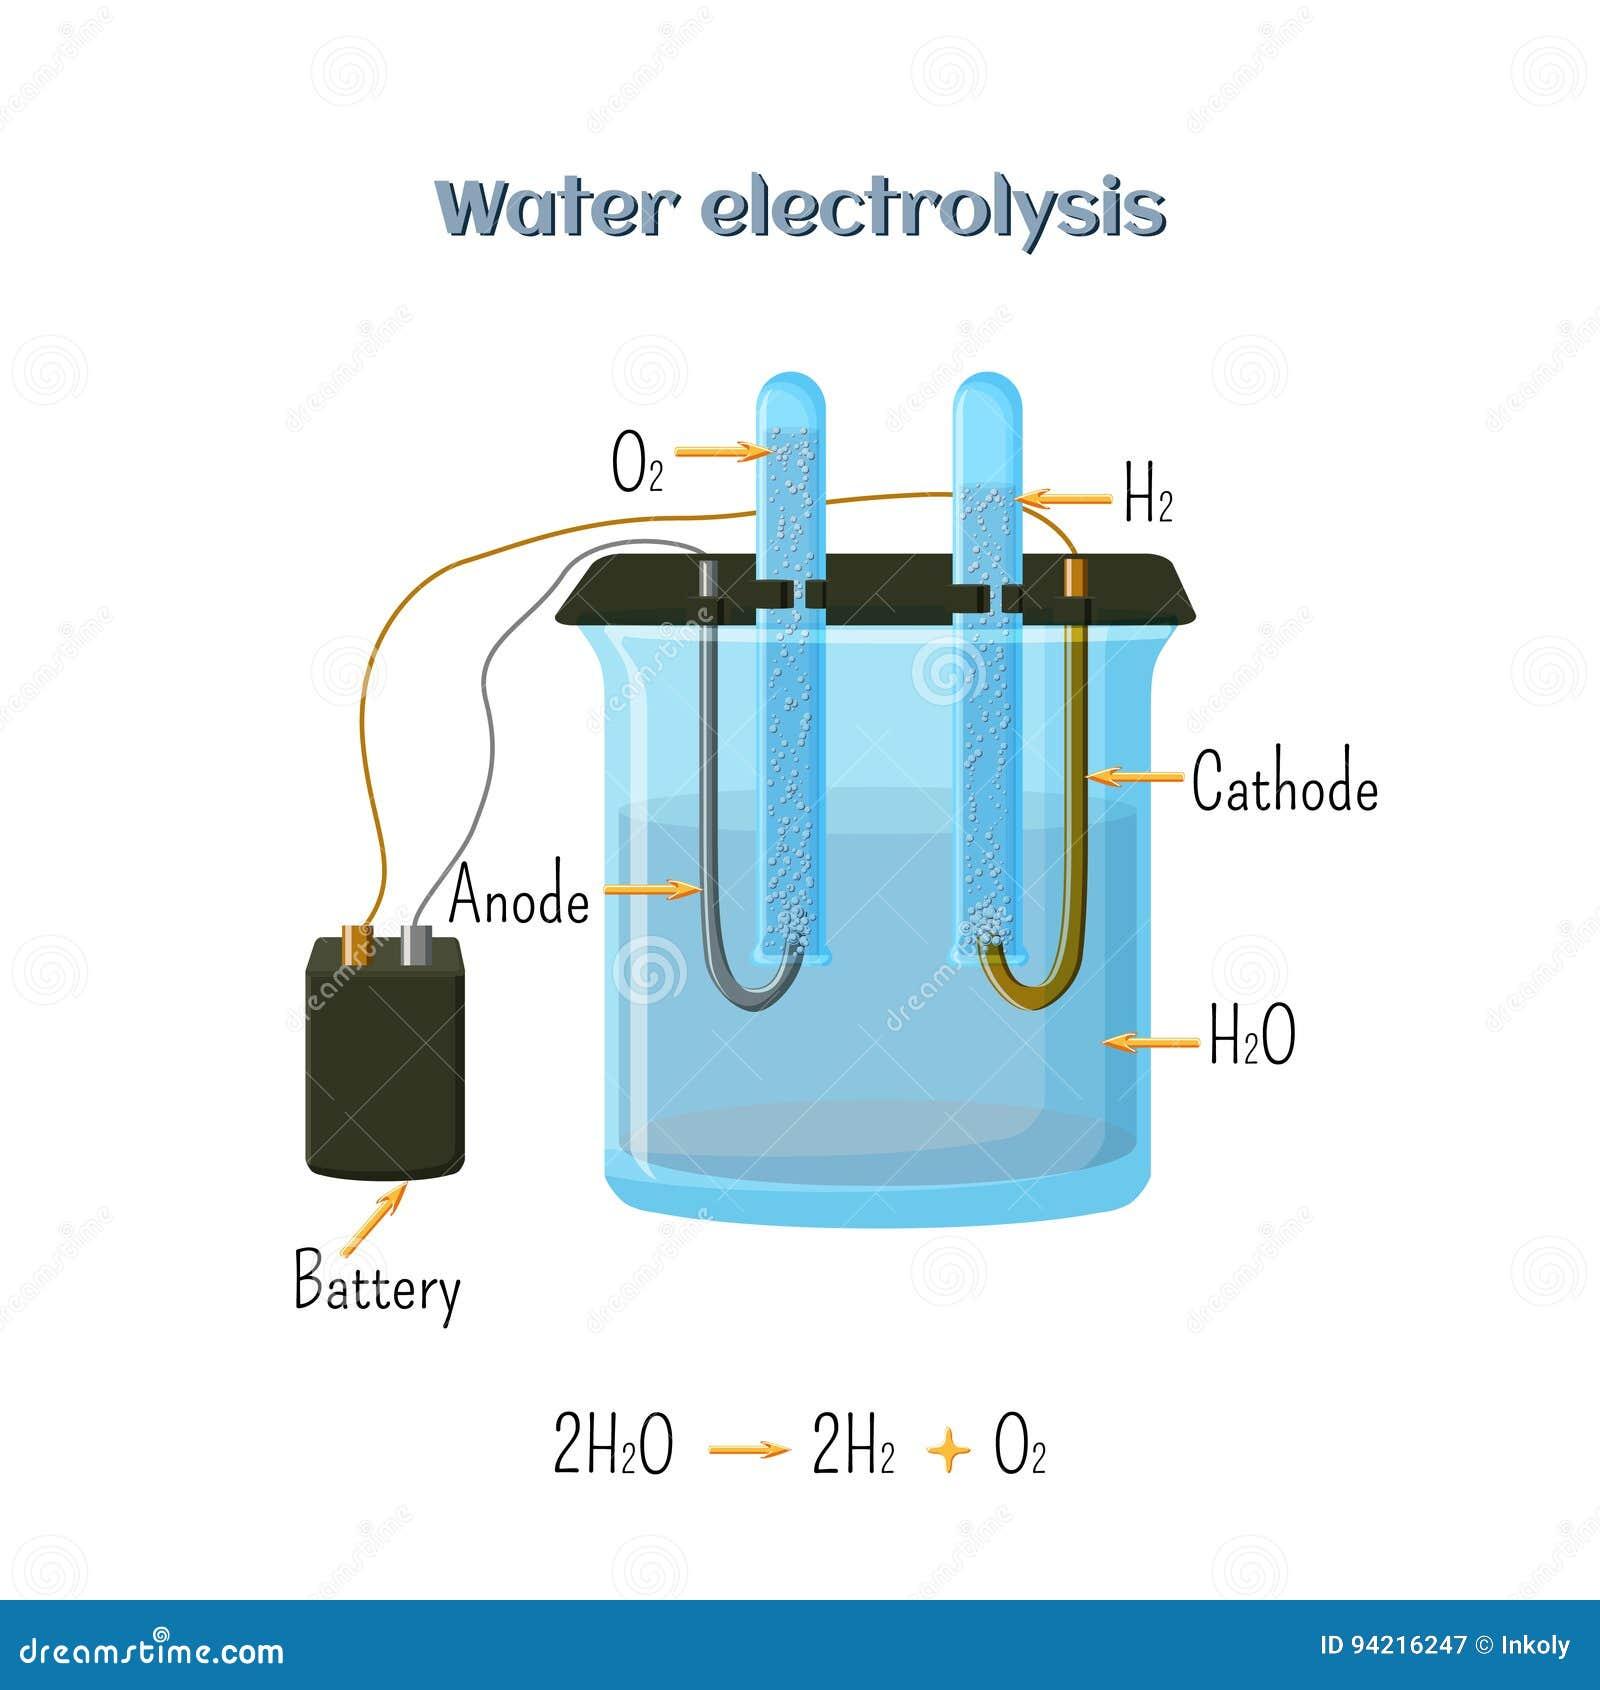 Water electrolysis diagram stock vector illustration of water electrolysis diagram pooptronica Choice Image